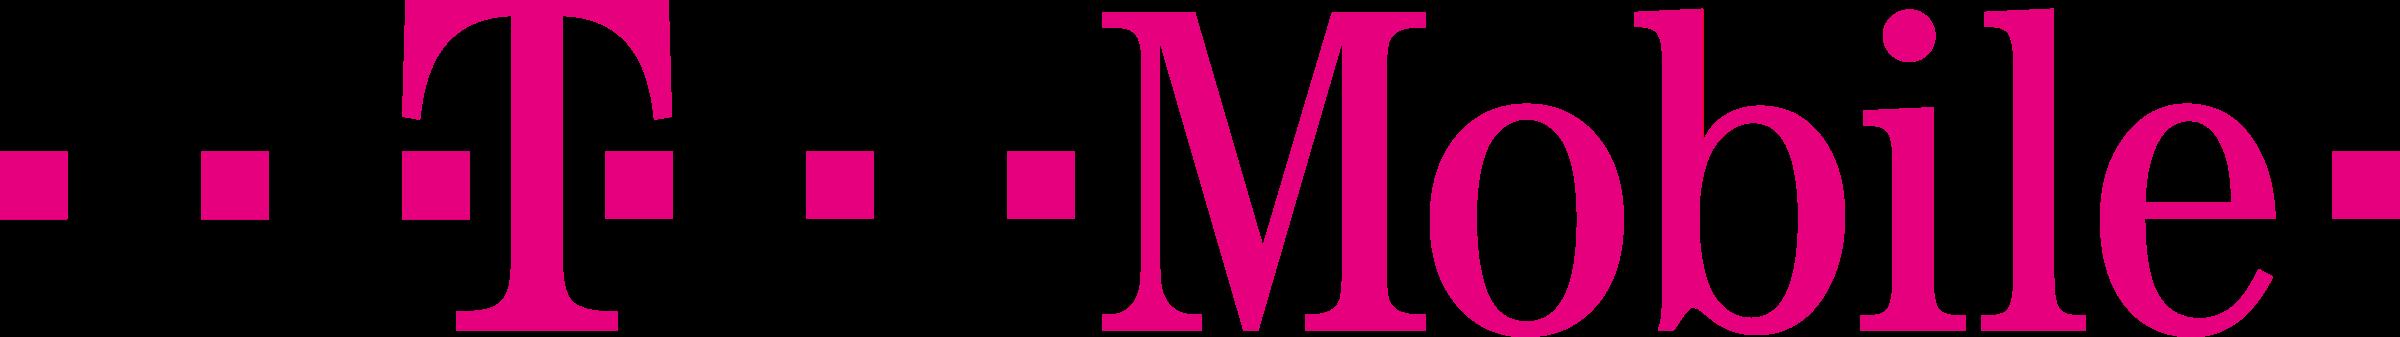 tmobile logo png transparent